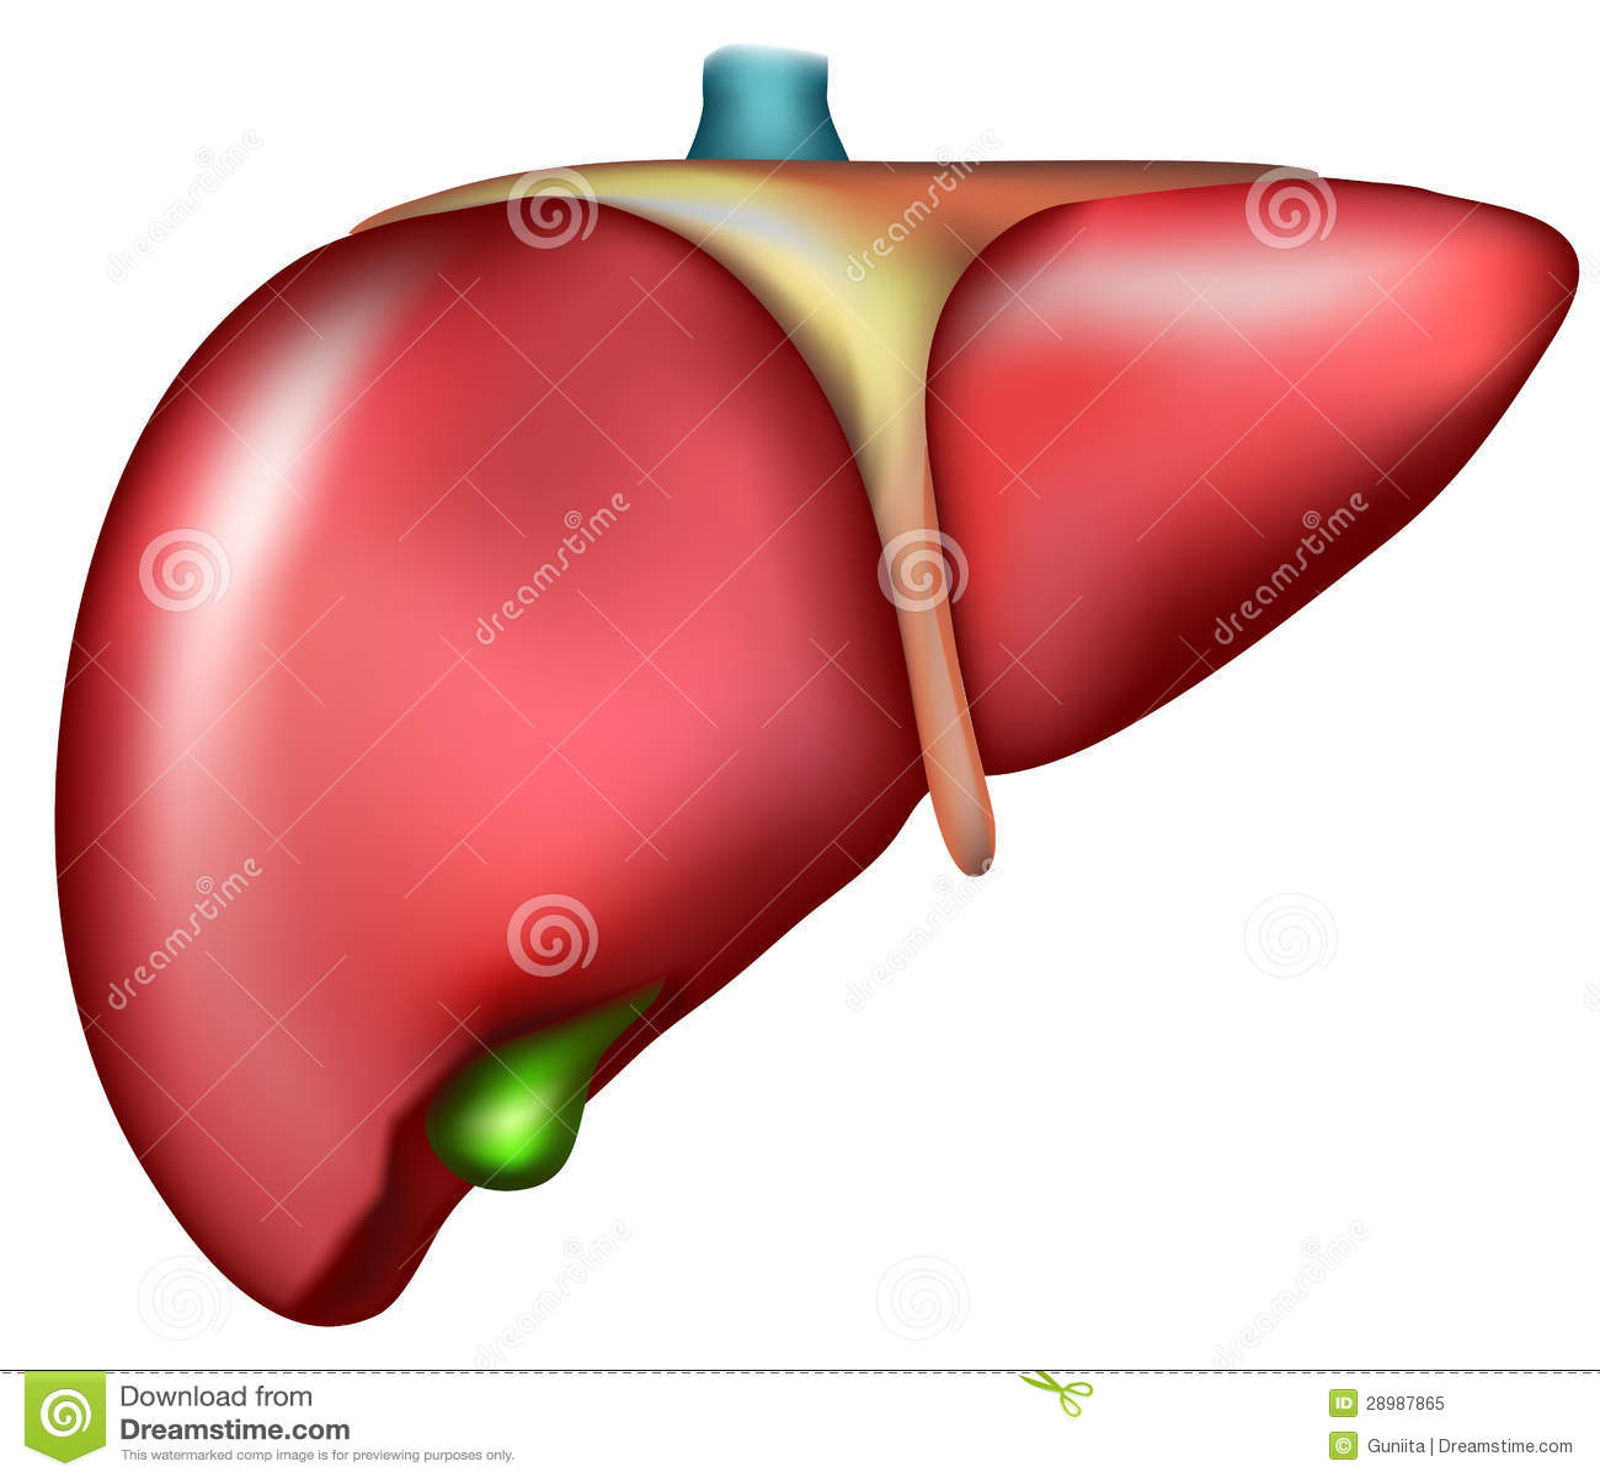 human liver diagram mitsubishi lancer cd player wiring stock vector illustration of chart